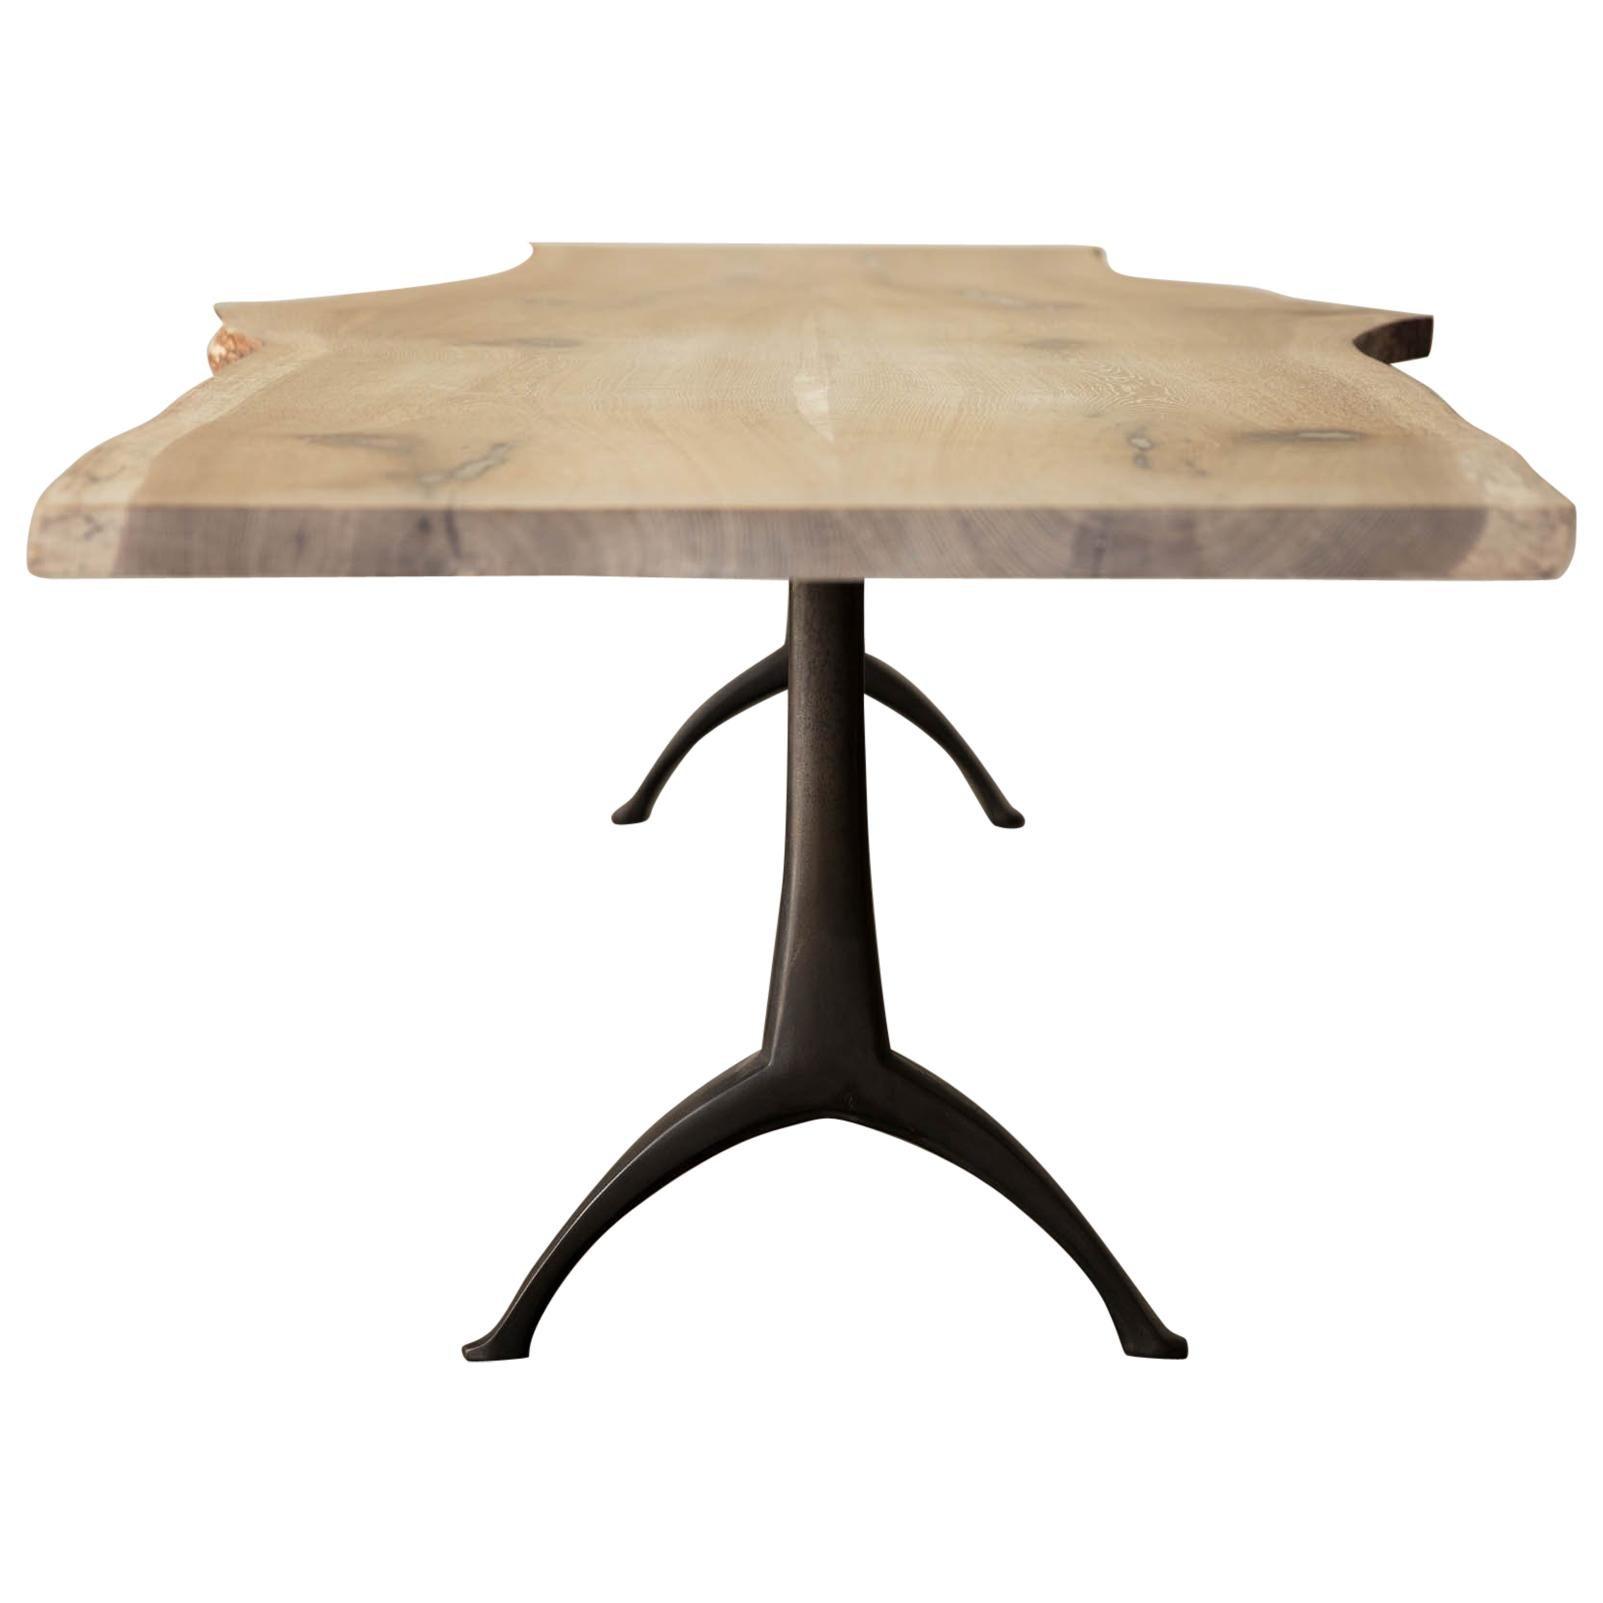 Live Edge White Oak Table Pewter Inlays Hand Cast Black Steel Pedestal Base